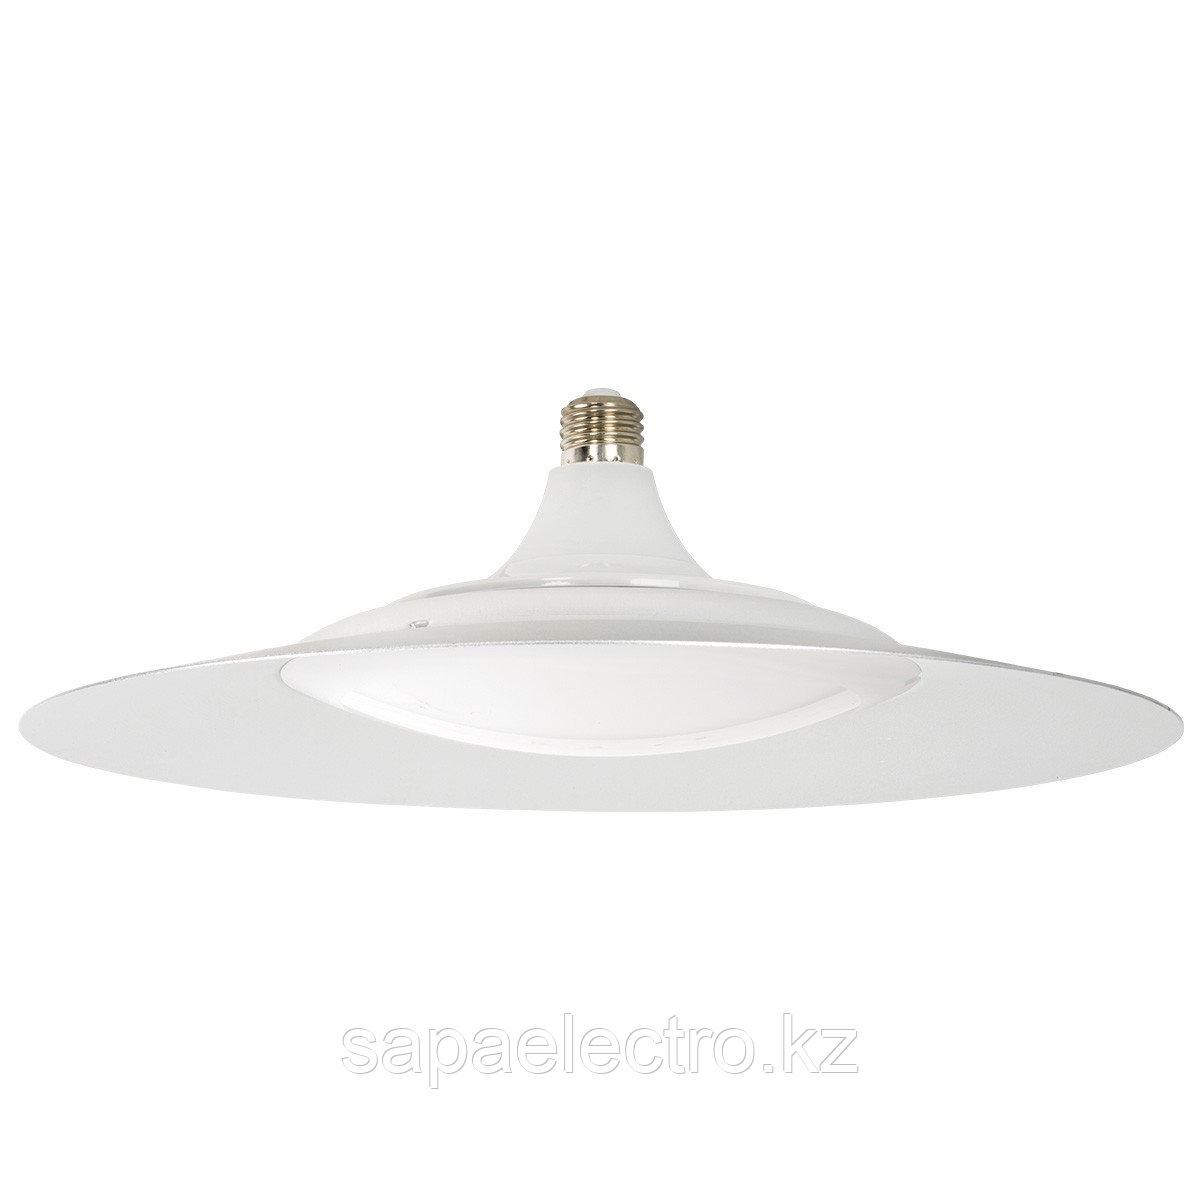 Свет-к UFO50 LED 50W E27 5700-6000K    (TS) 10шт